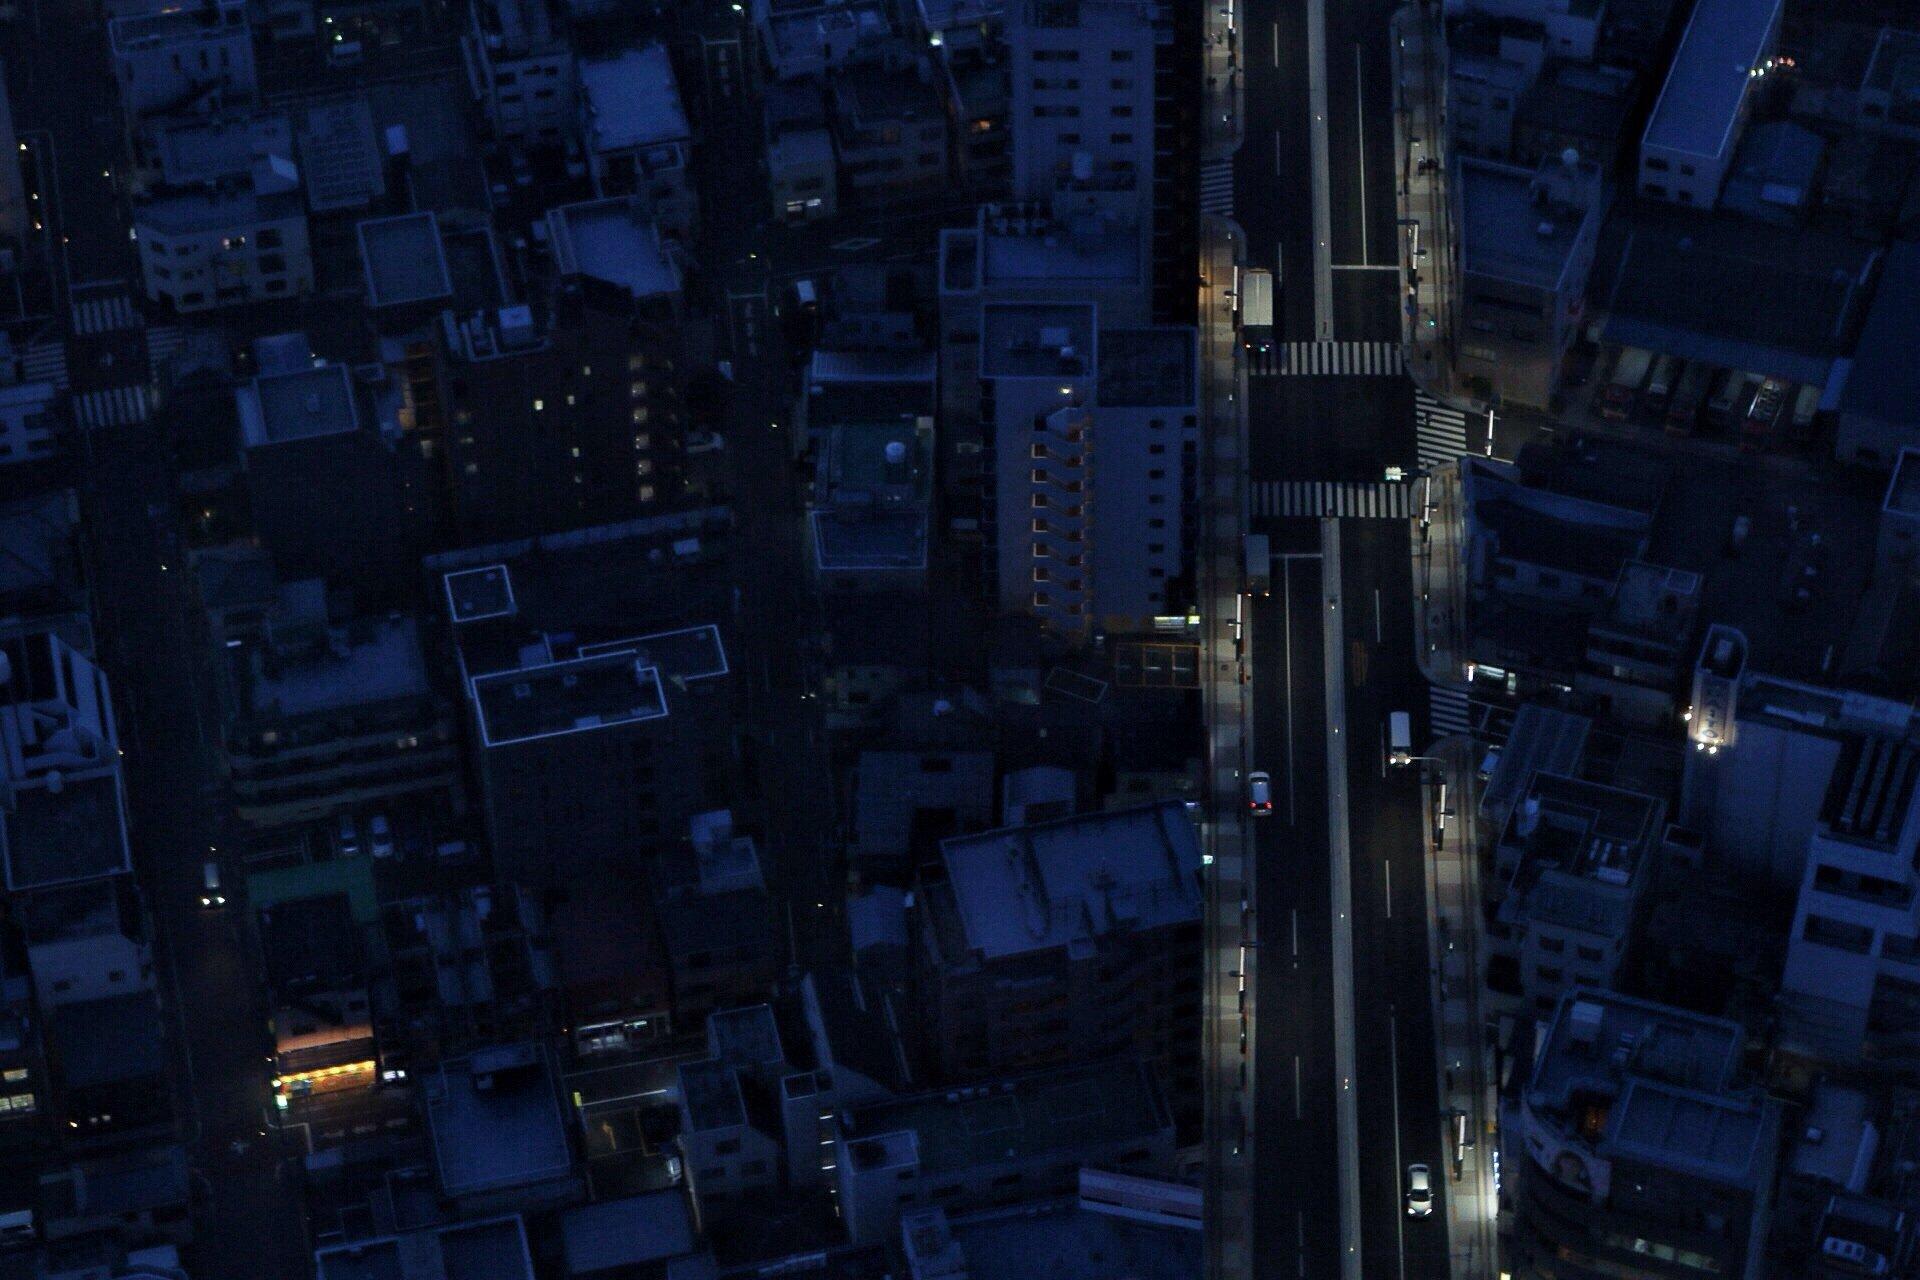 tokyo-from-above-2-kasuma-photo-blog